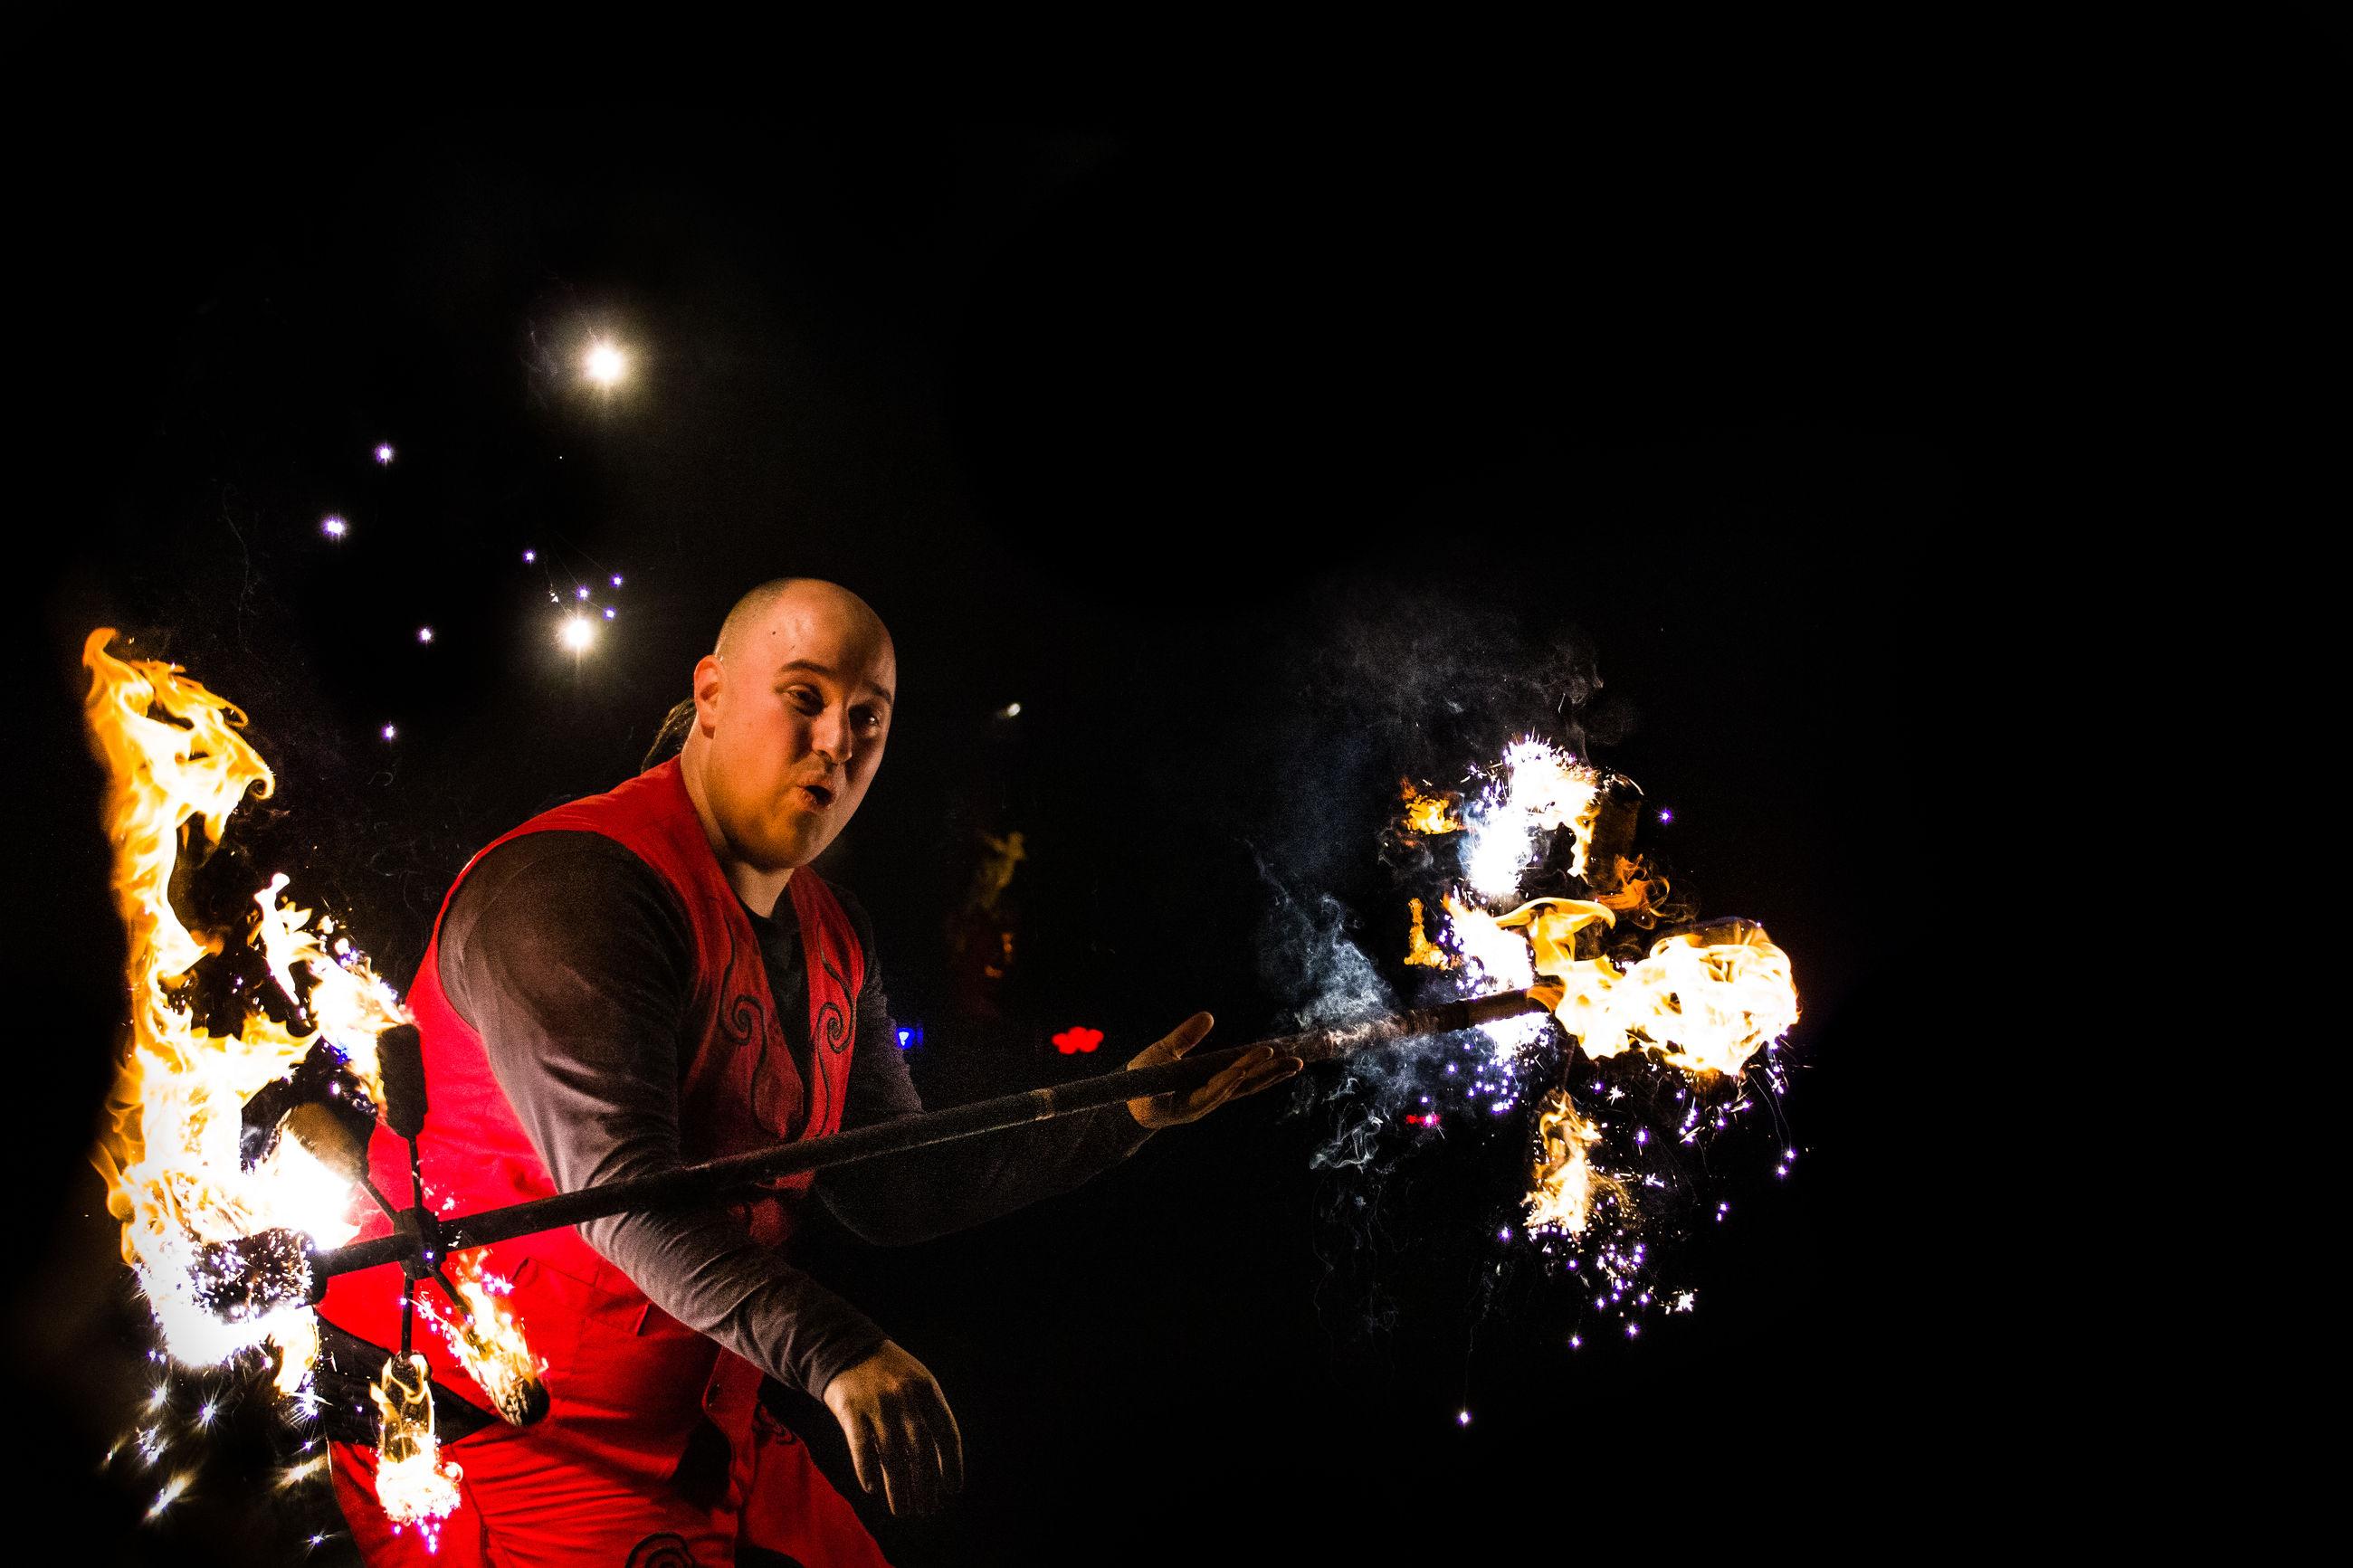 LOW ANGLE VIEW OF MAN HOLDING ILLUMINATED BONFIRE